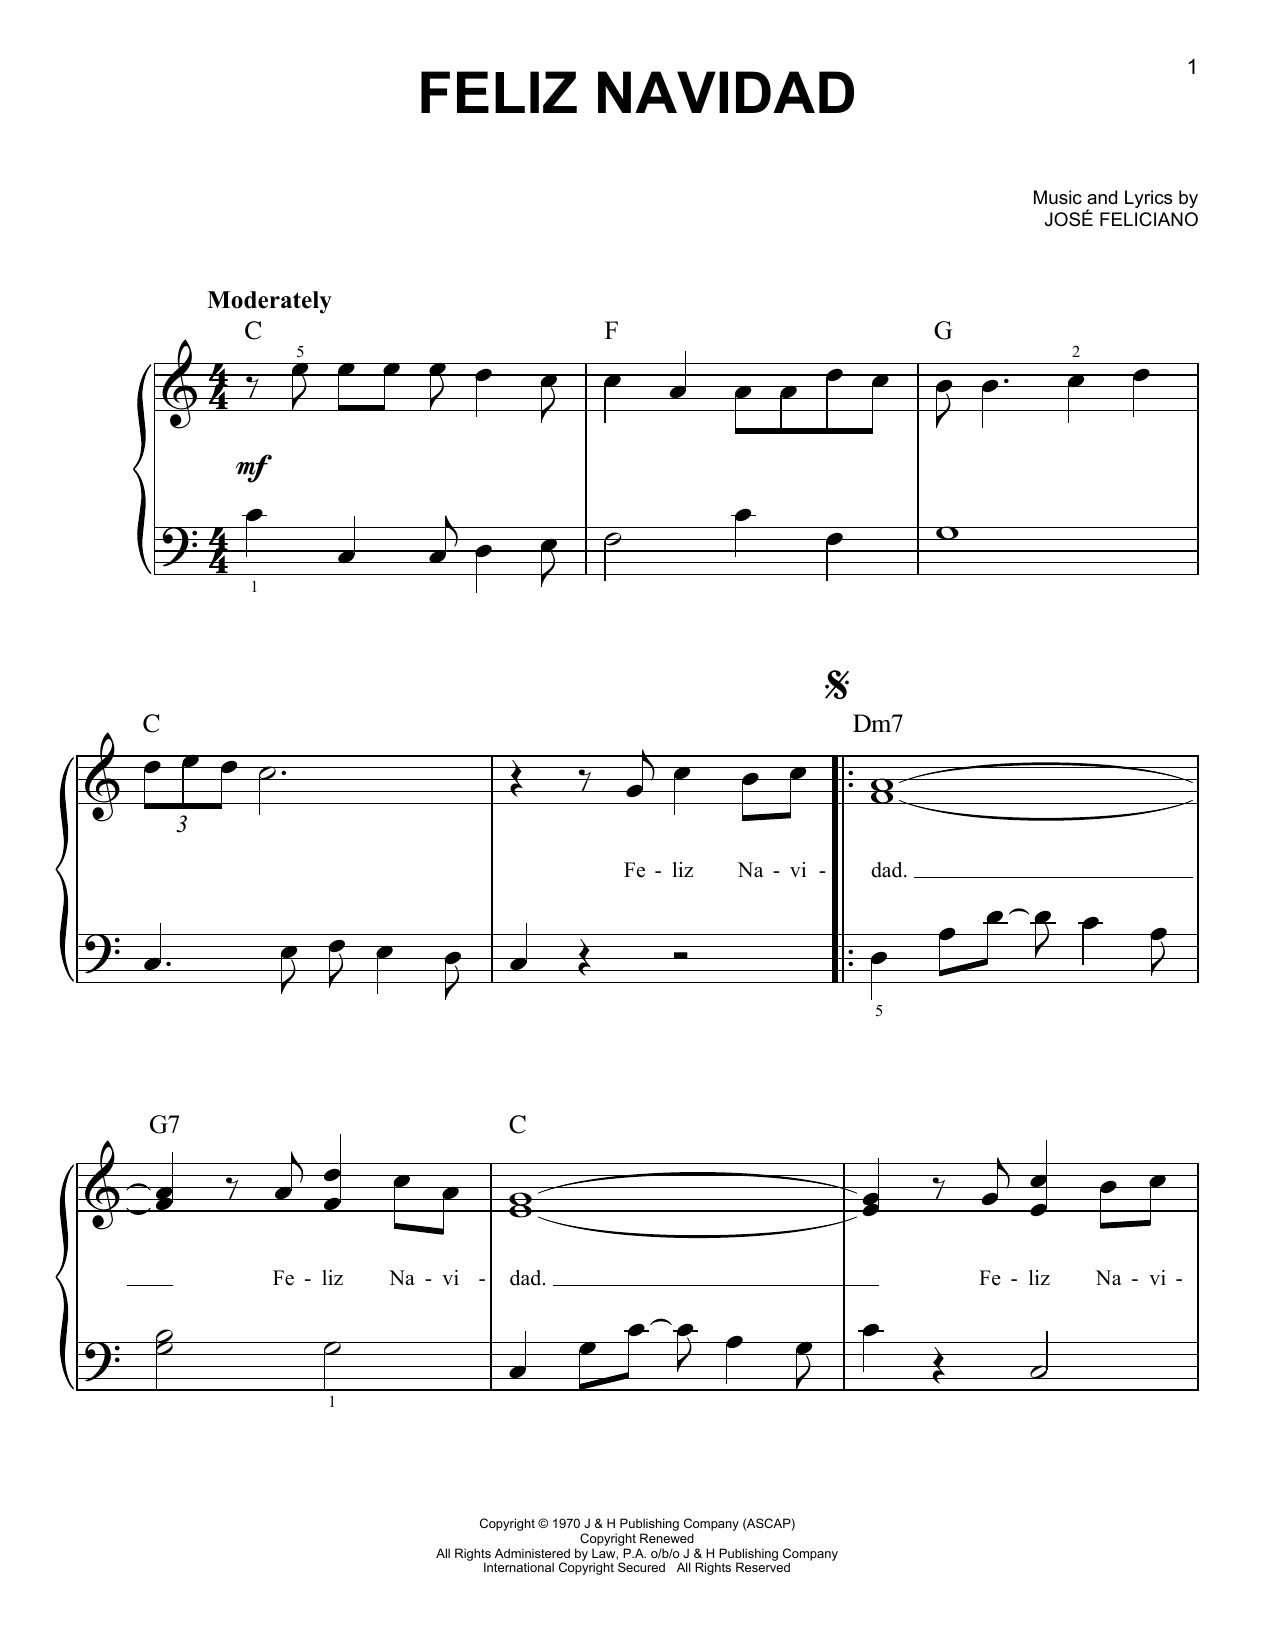 jose feliciano feliz navidad sheet music pdf notes chords christmas score guitar ensemble download printable sku 199868 jose feliciano feliz navidad sheet music notes chords download printable guitar ensemble sku 199868